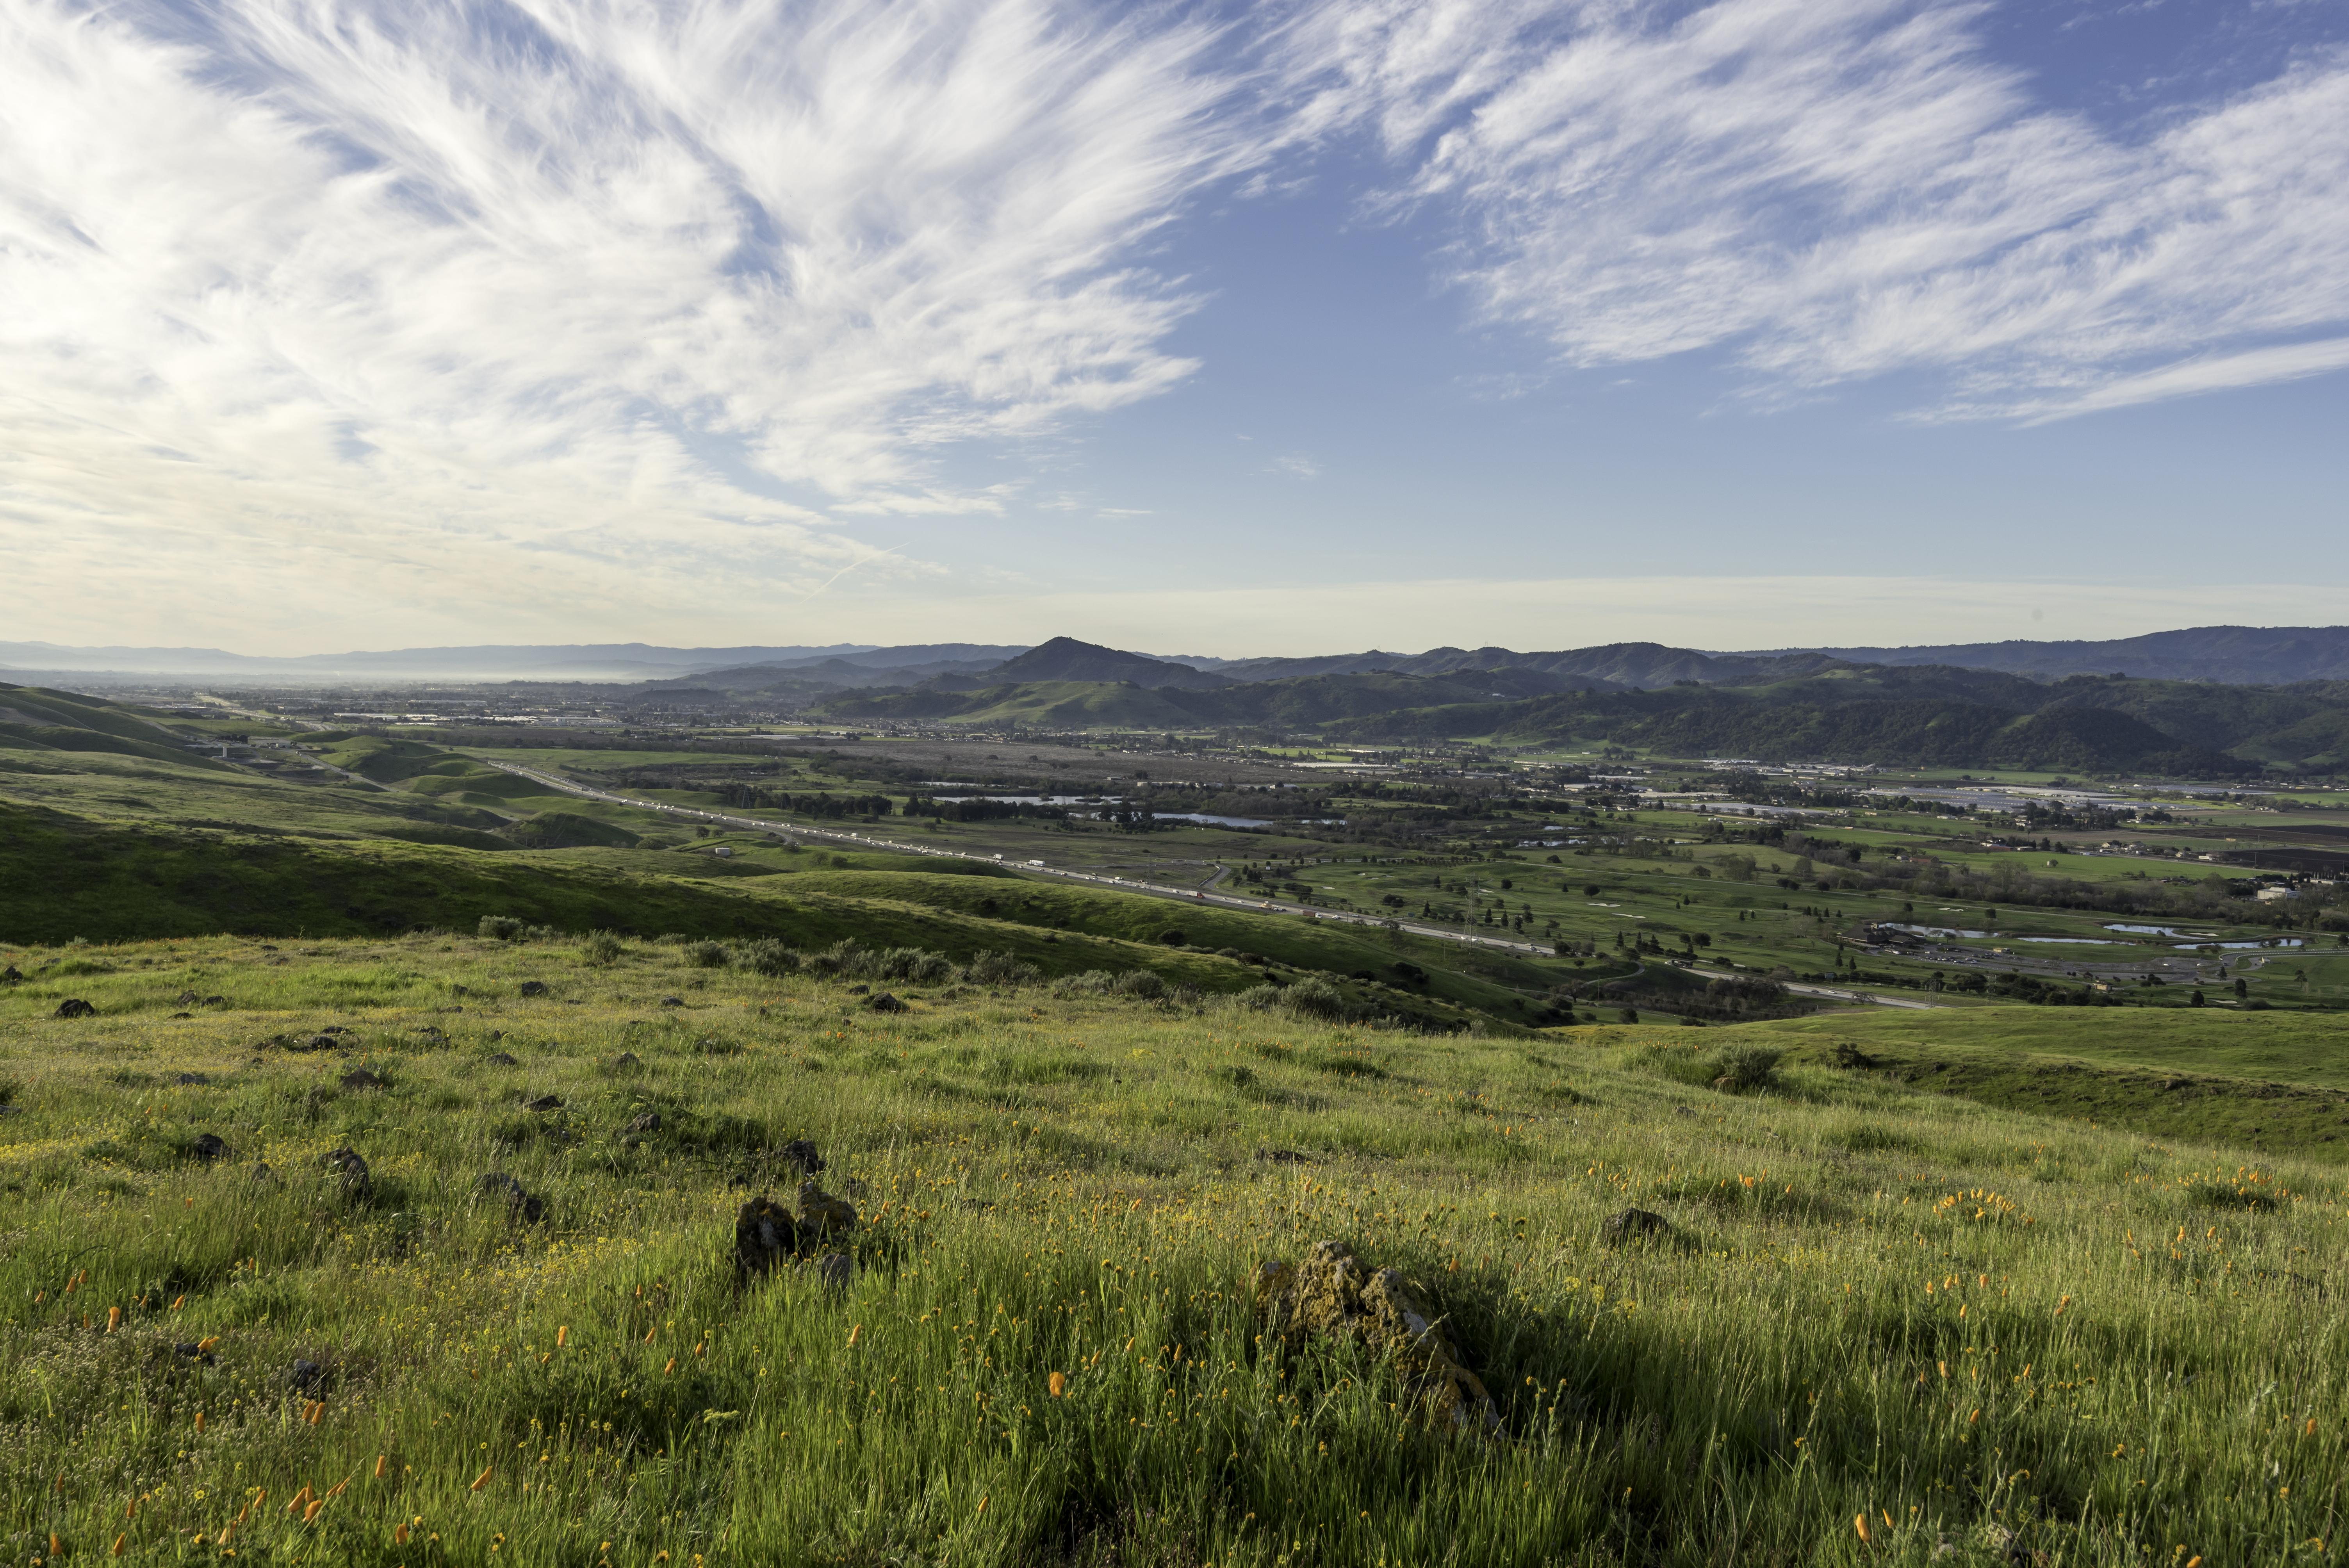 Coyote Ridge - Landscapes - DN - 3-19-16 - 19-1